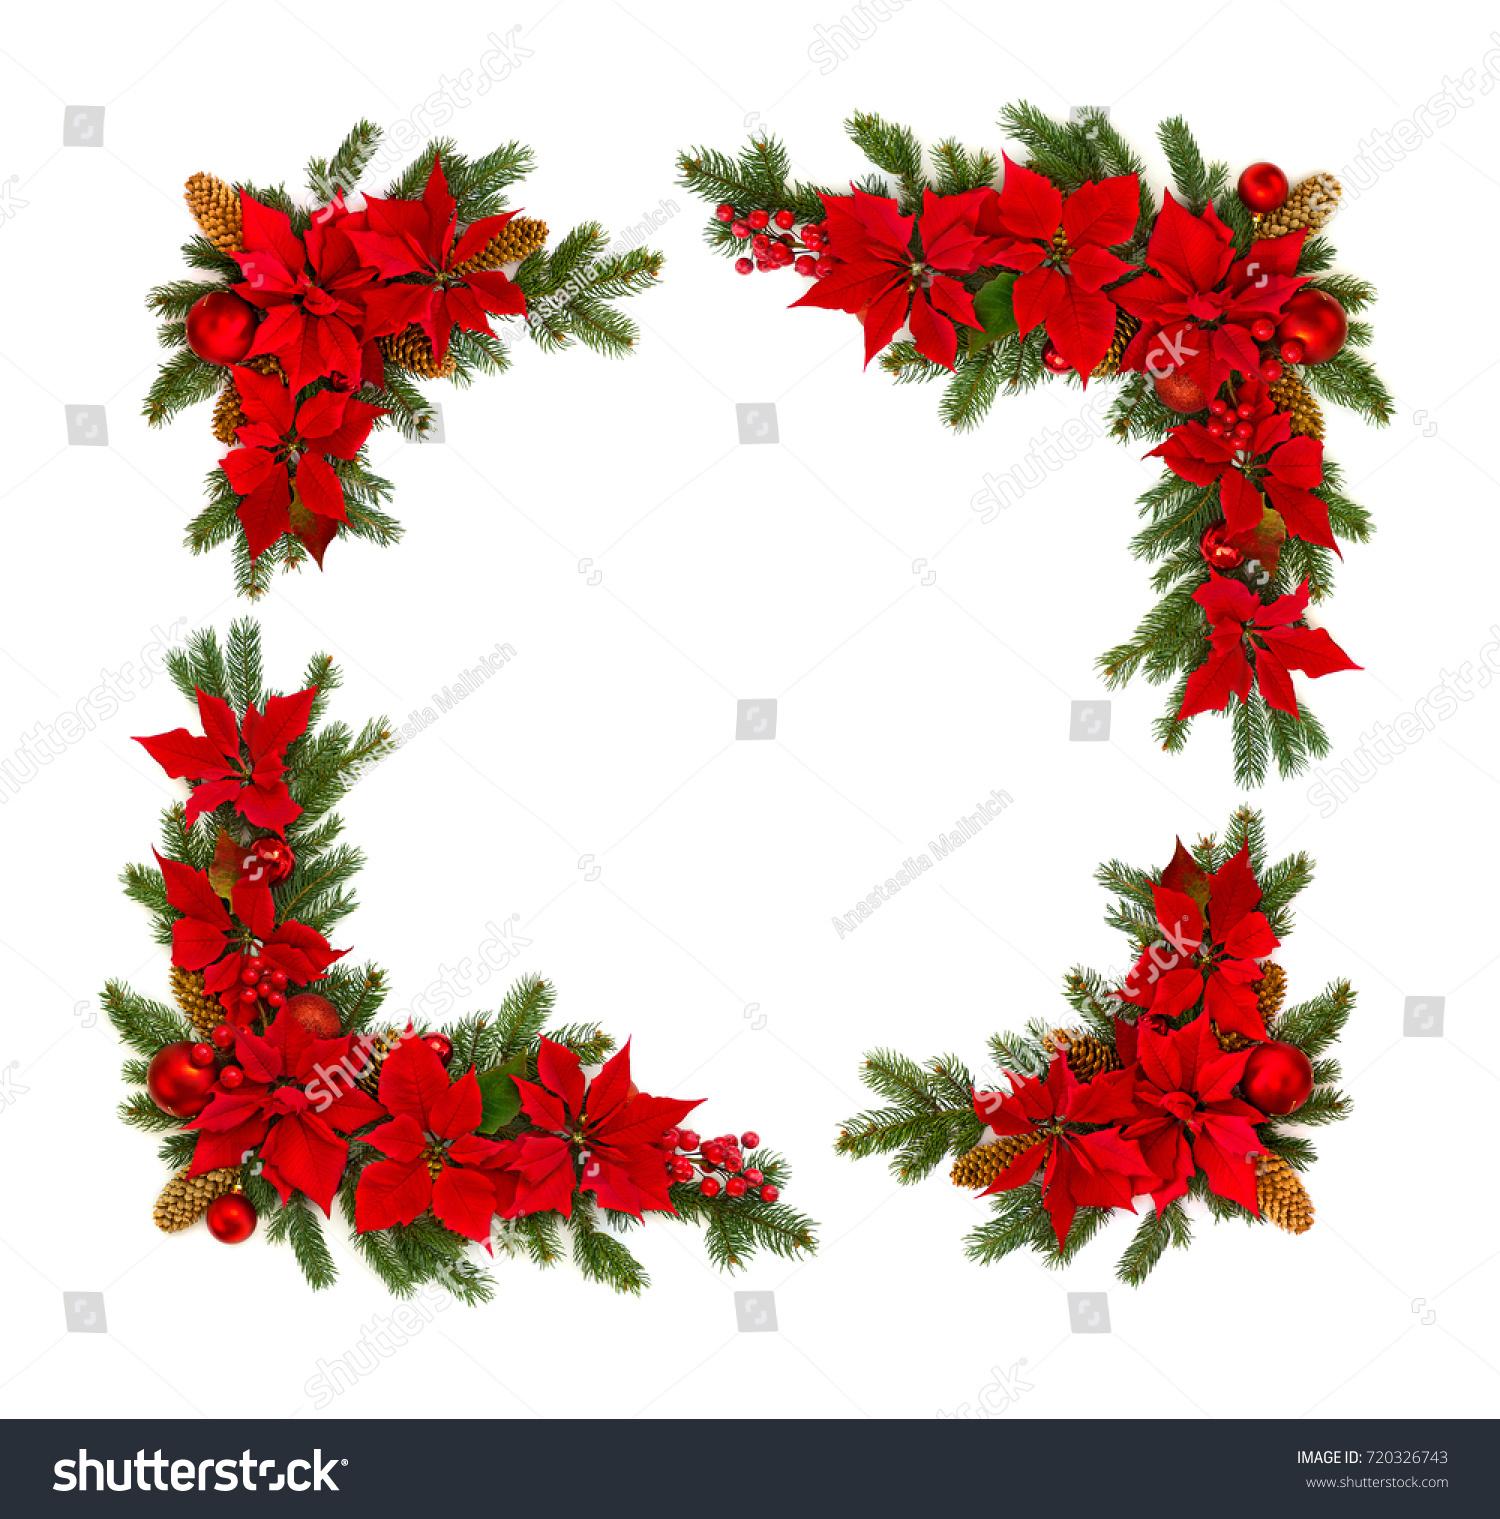 Christmas decoration frame flower red poinsettia stock for Poinsettia christmas tree frame